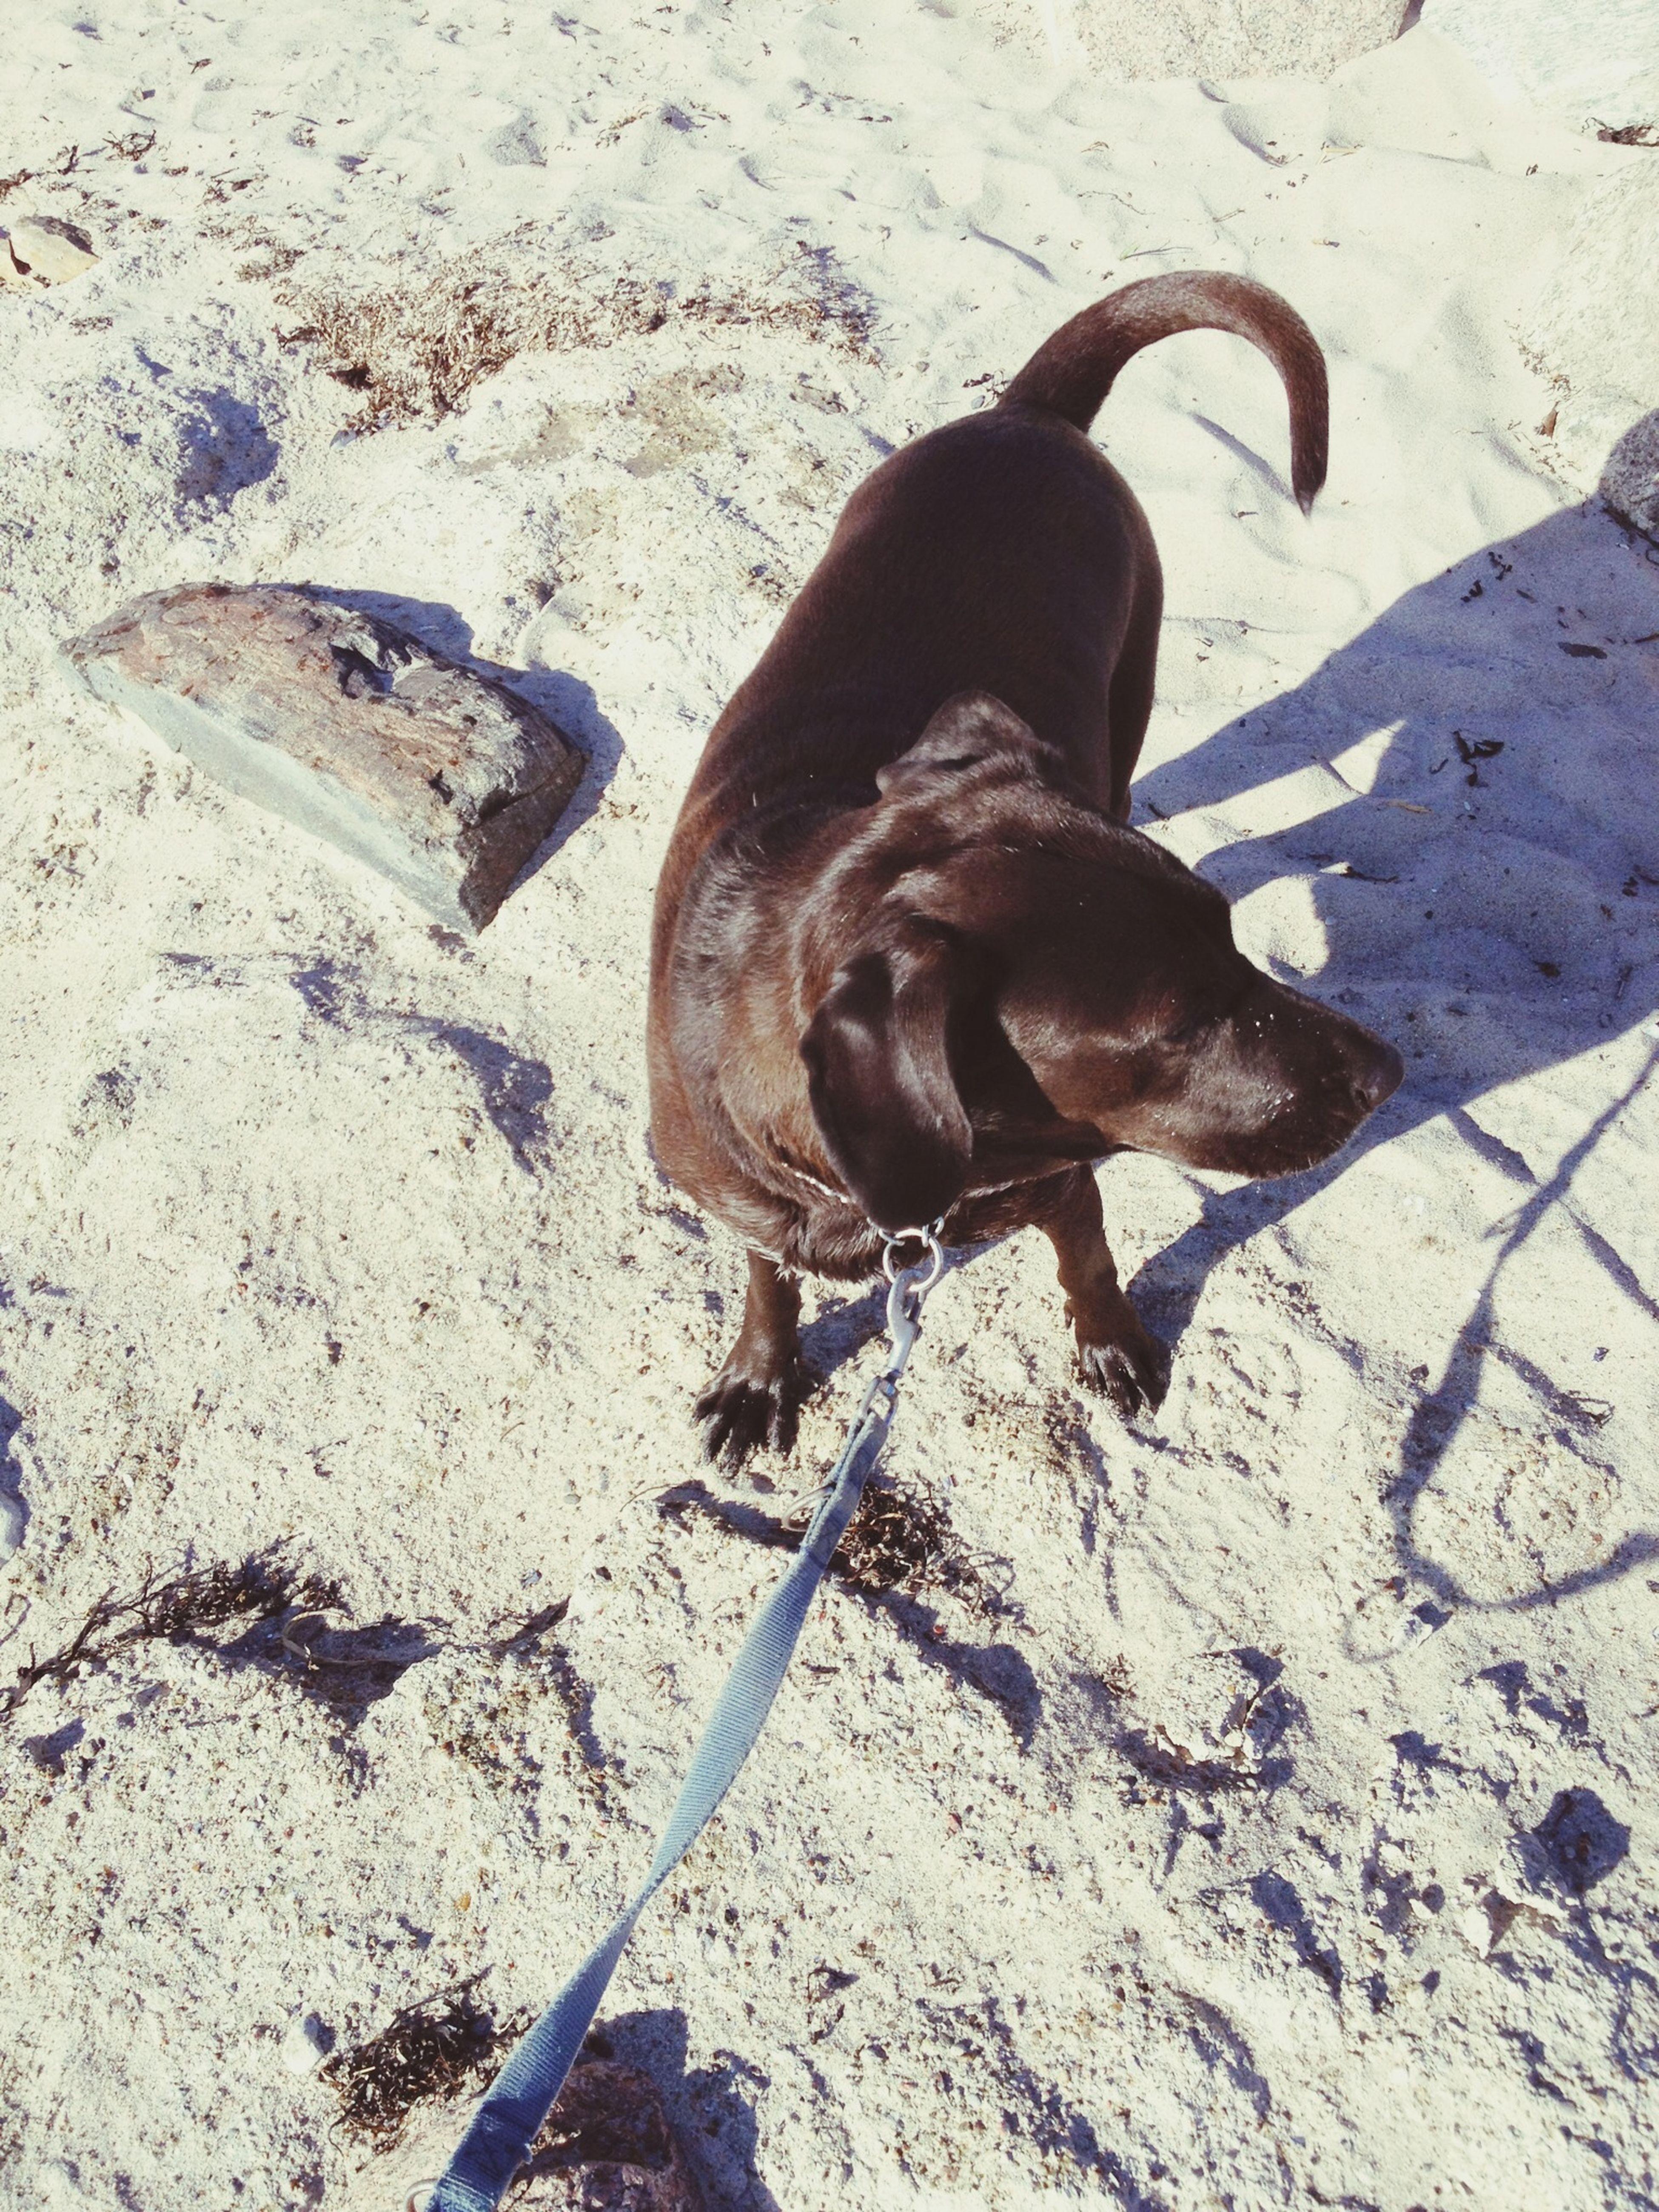 Hundamstrand Hund Dog Strand